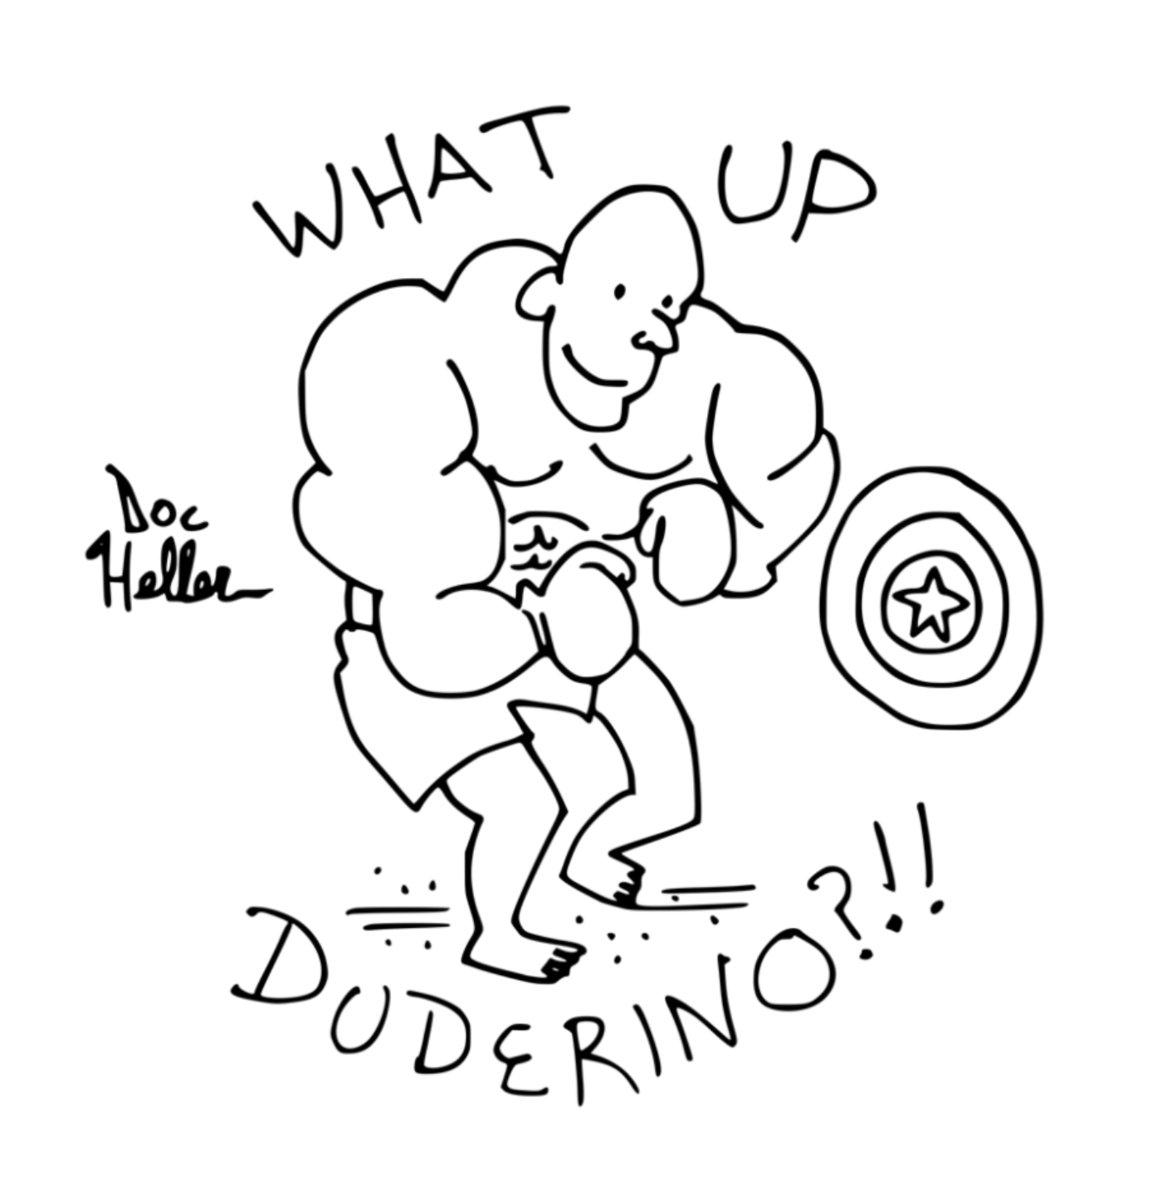 Darko The Super - What Up Duderino?!!